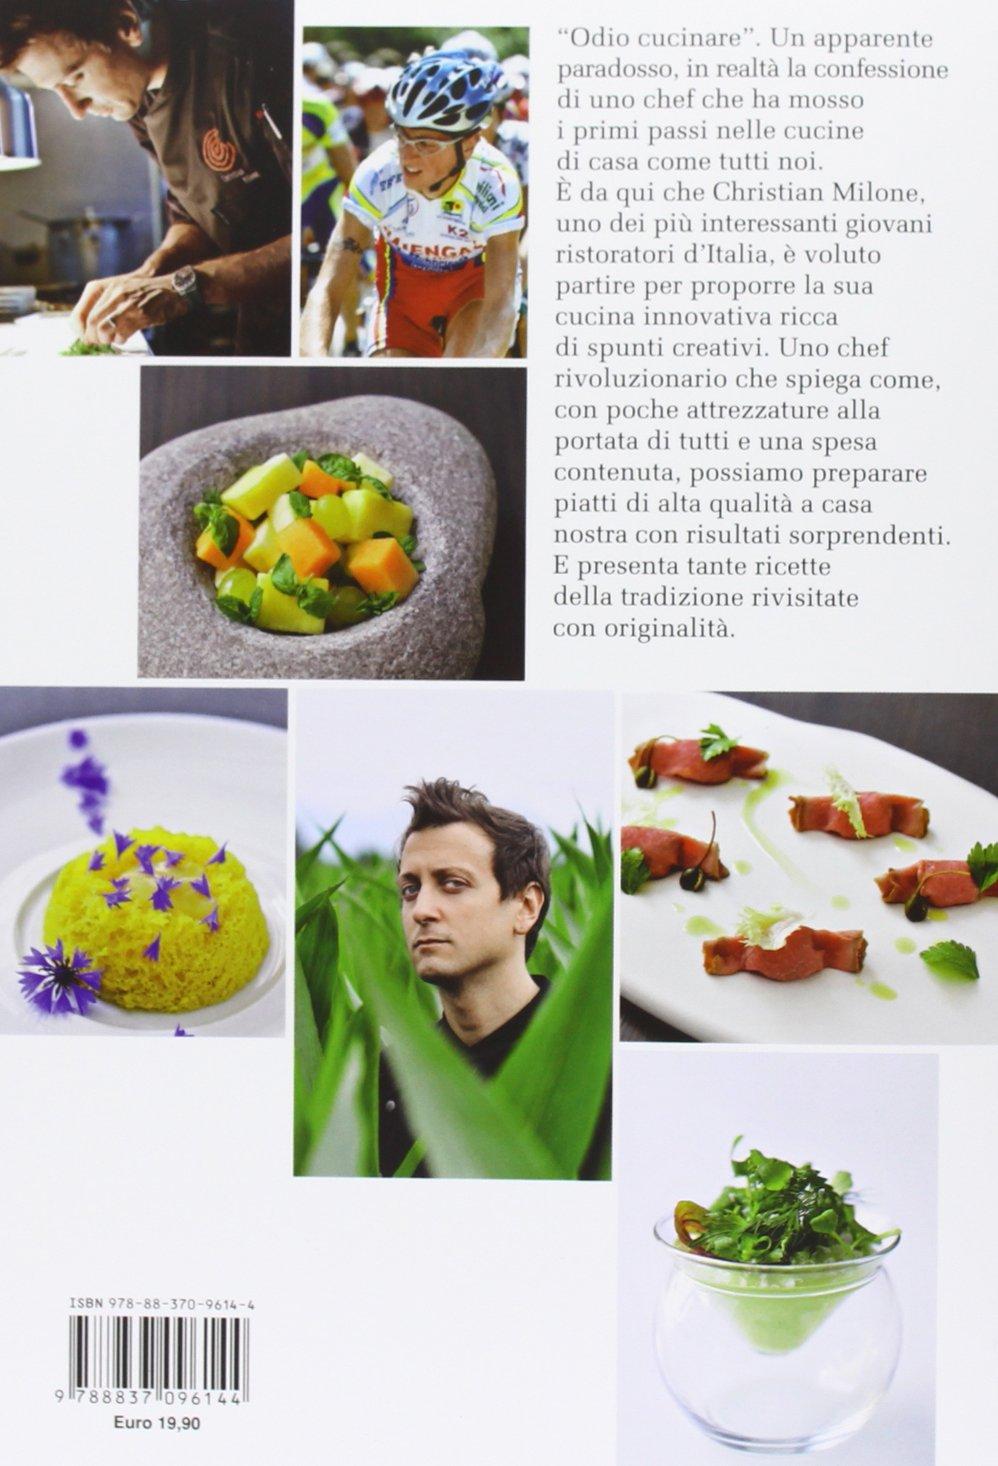 Odio cucinare (Gastronomia miscellanea): Amazon.es: Christian Milone, C. Orlandi: Libros en idiomas extranjeros